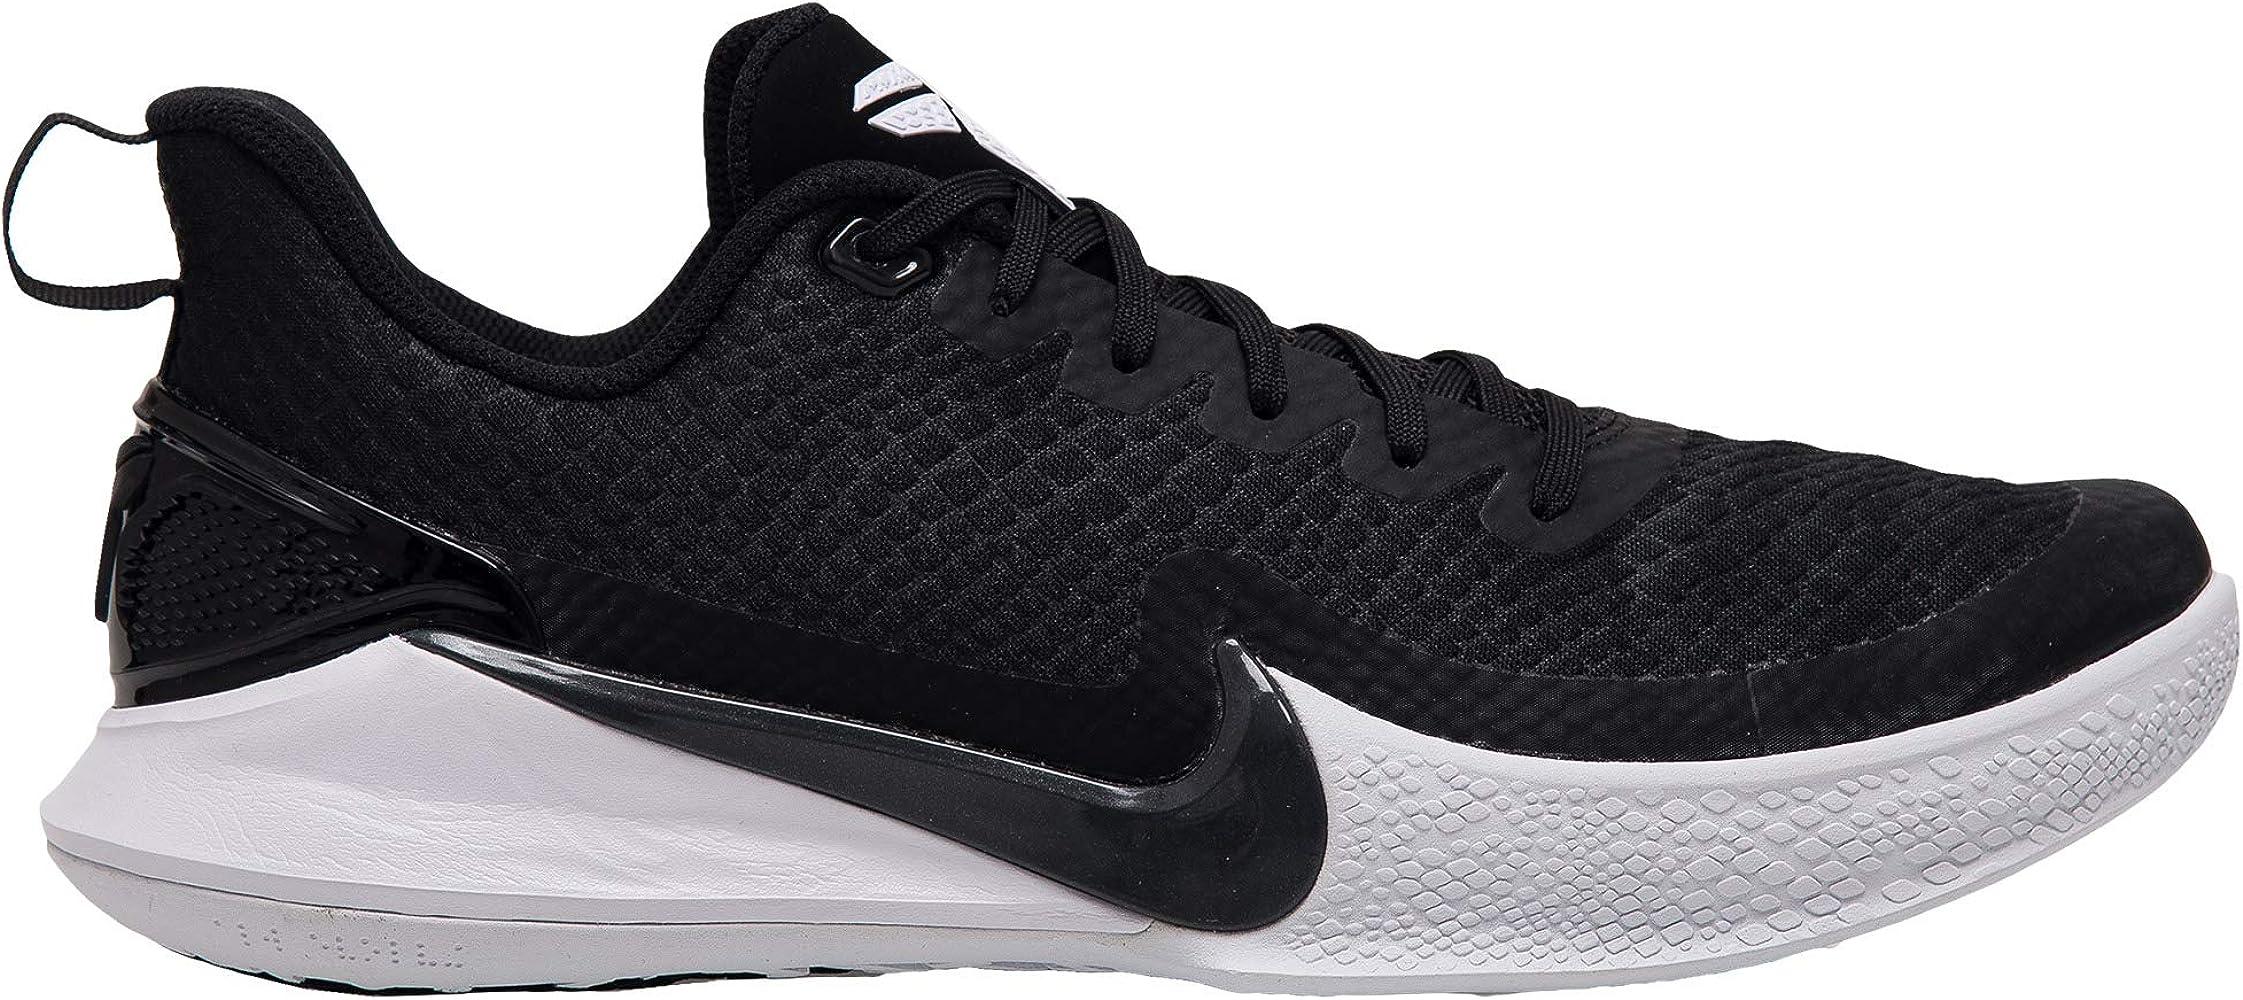 Amazon.com: Nike Kobe Mamba Rage - Zapatillas de baloncesto ...